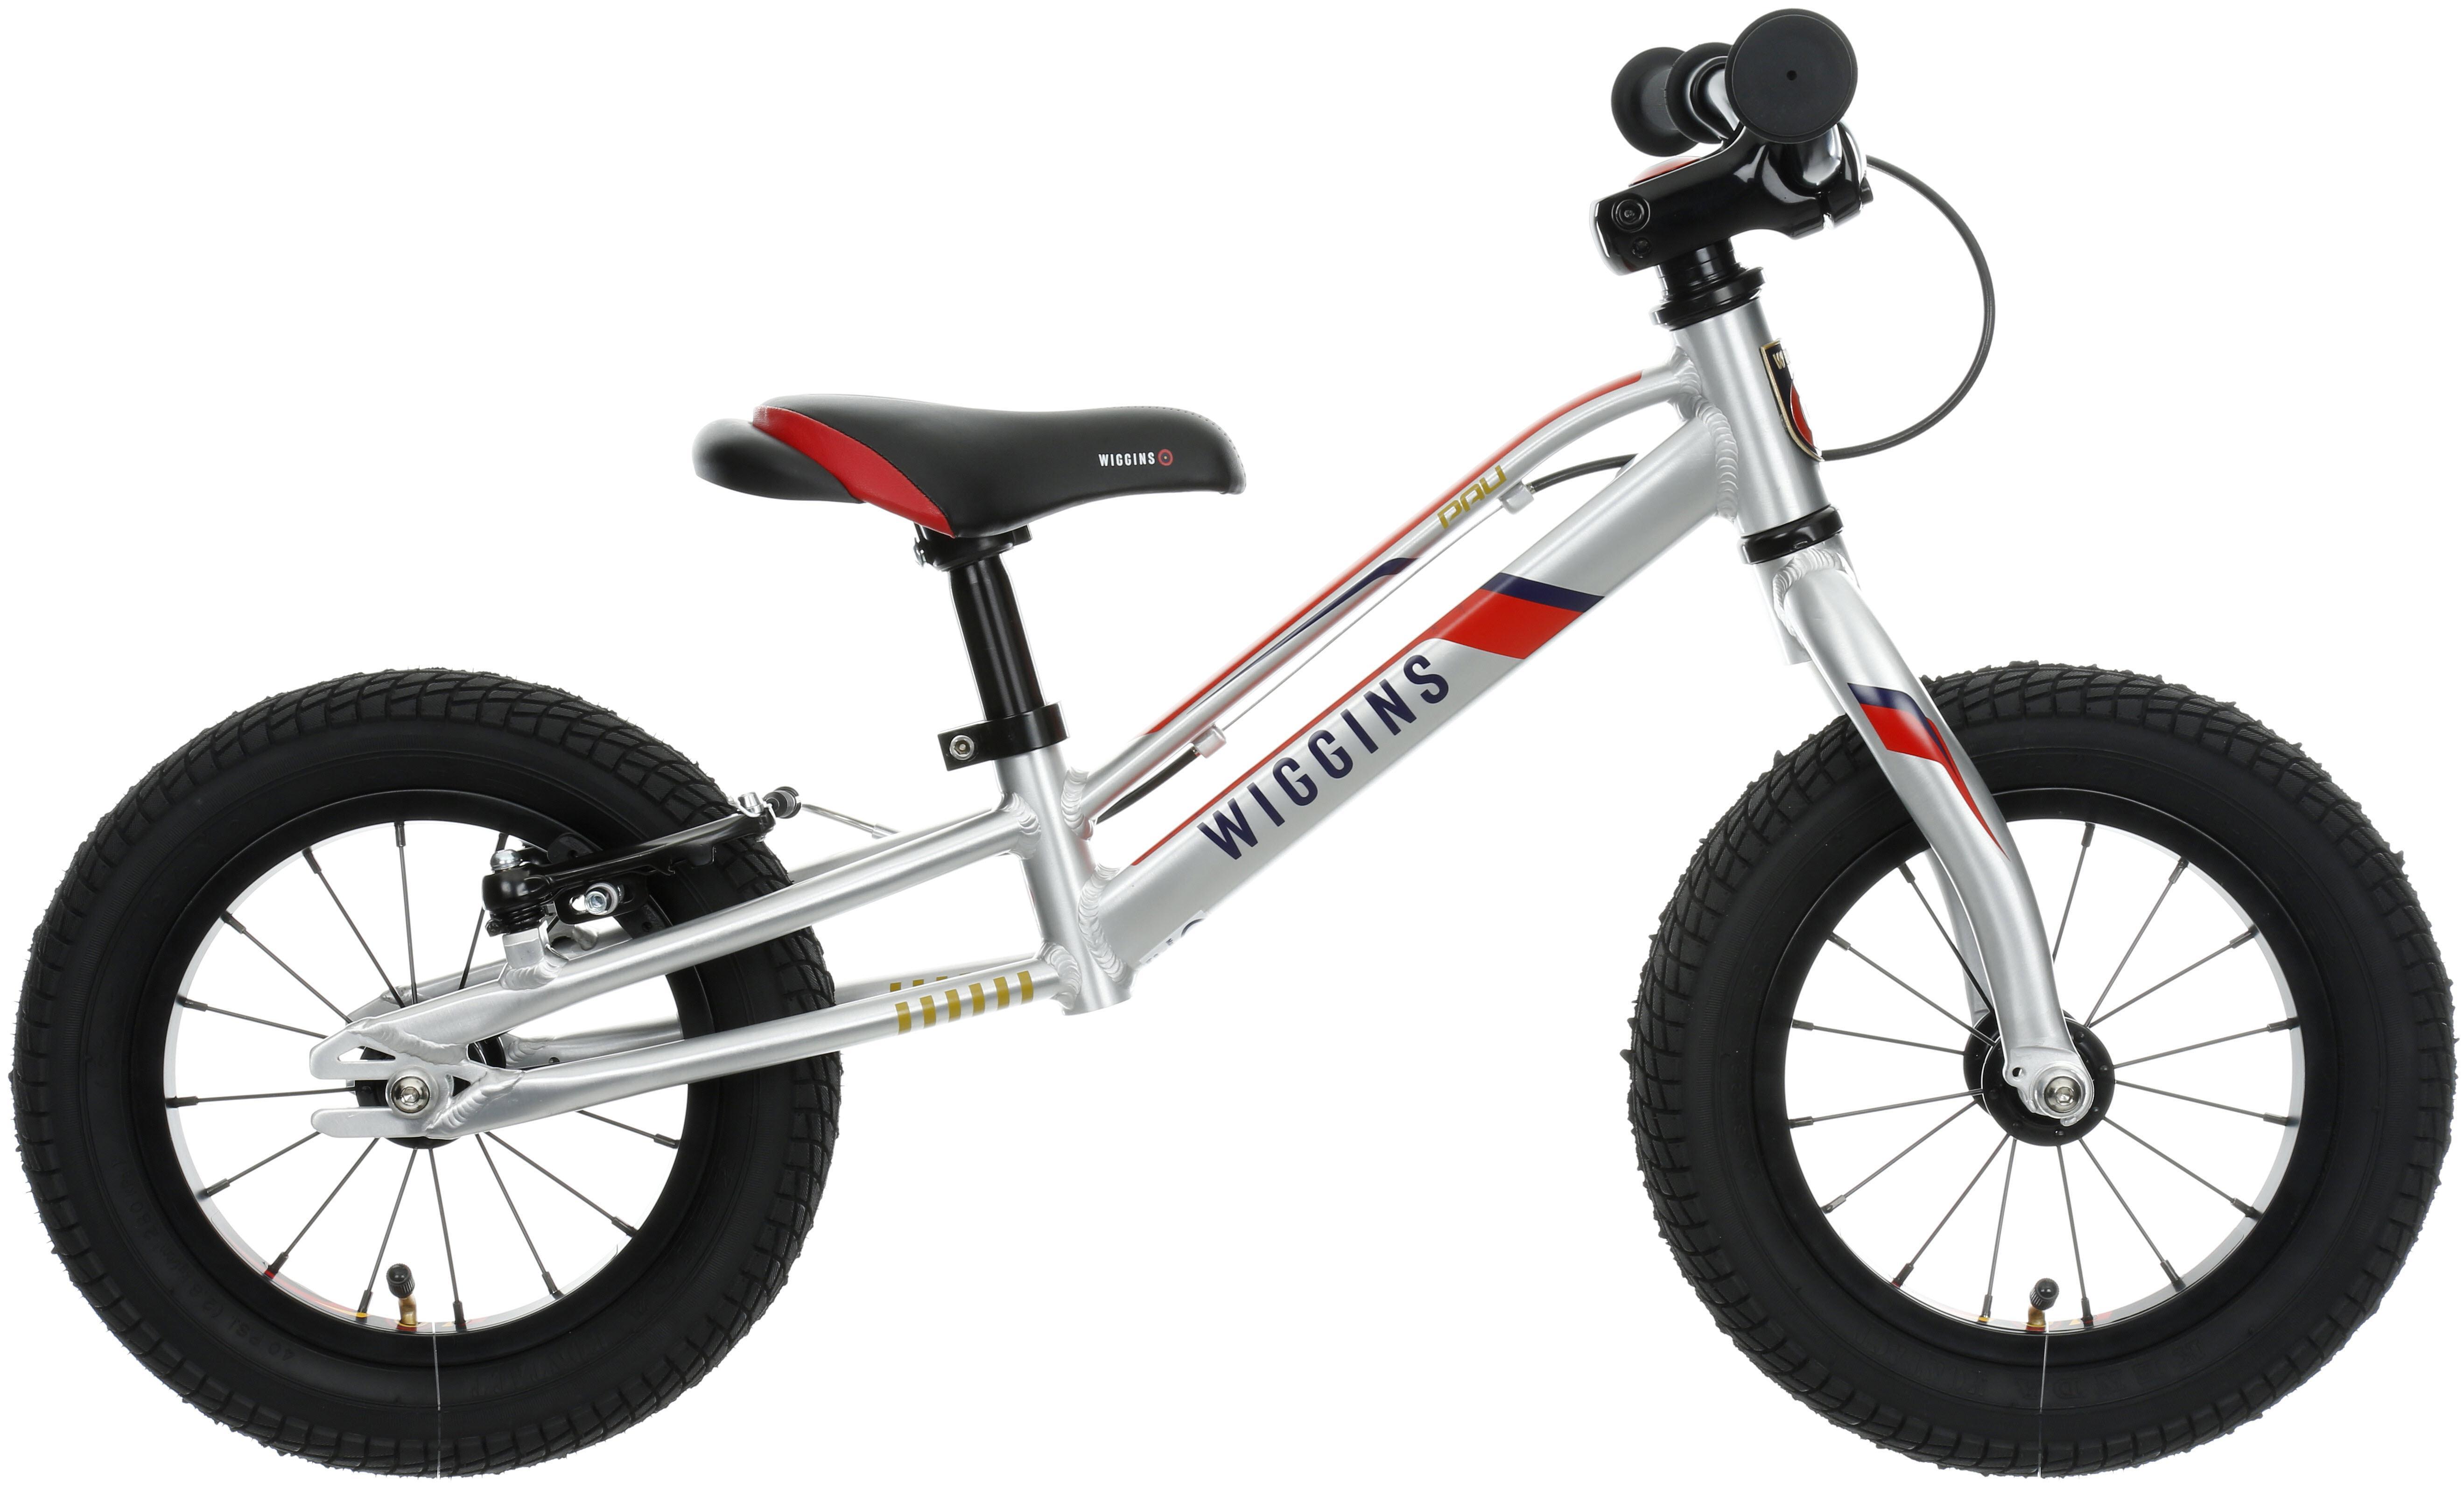 Wiggins balance bike